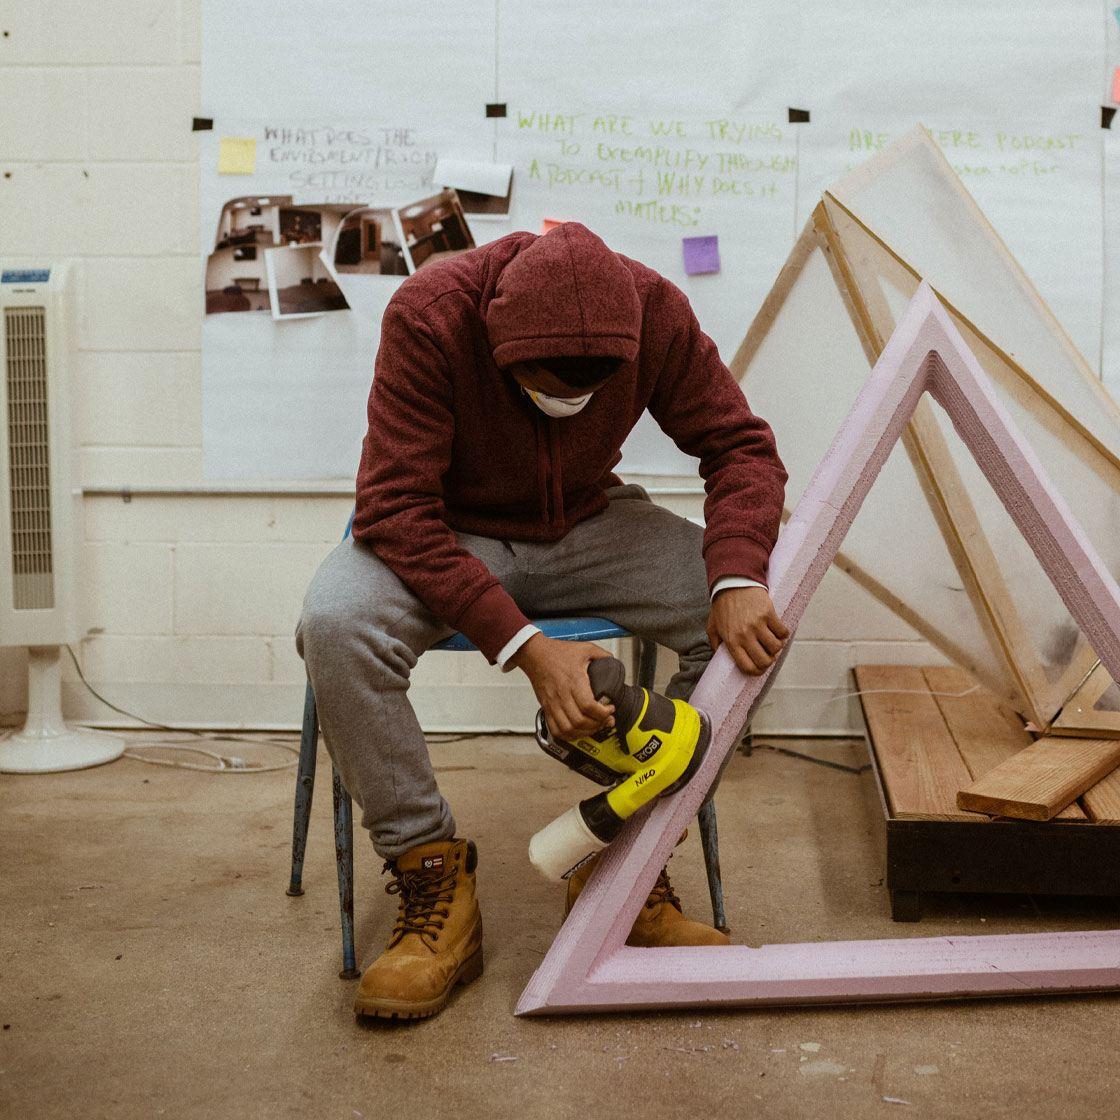 Someone working on a styrofoam pyramidal shaped sculpture